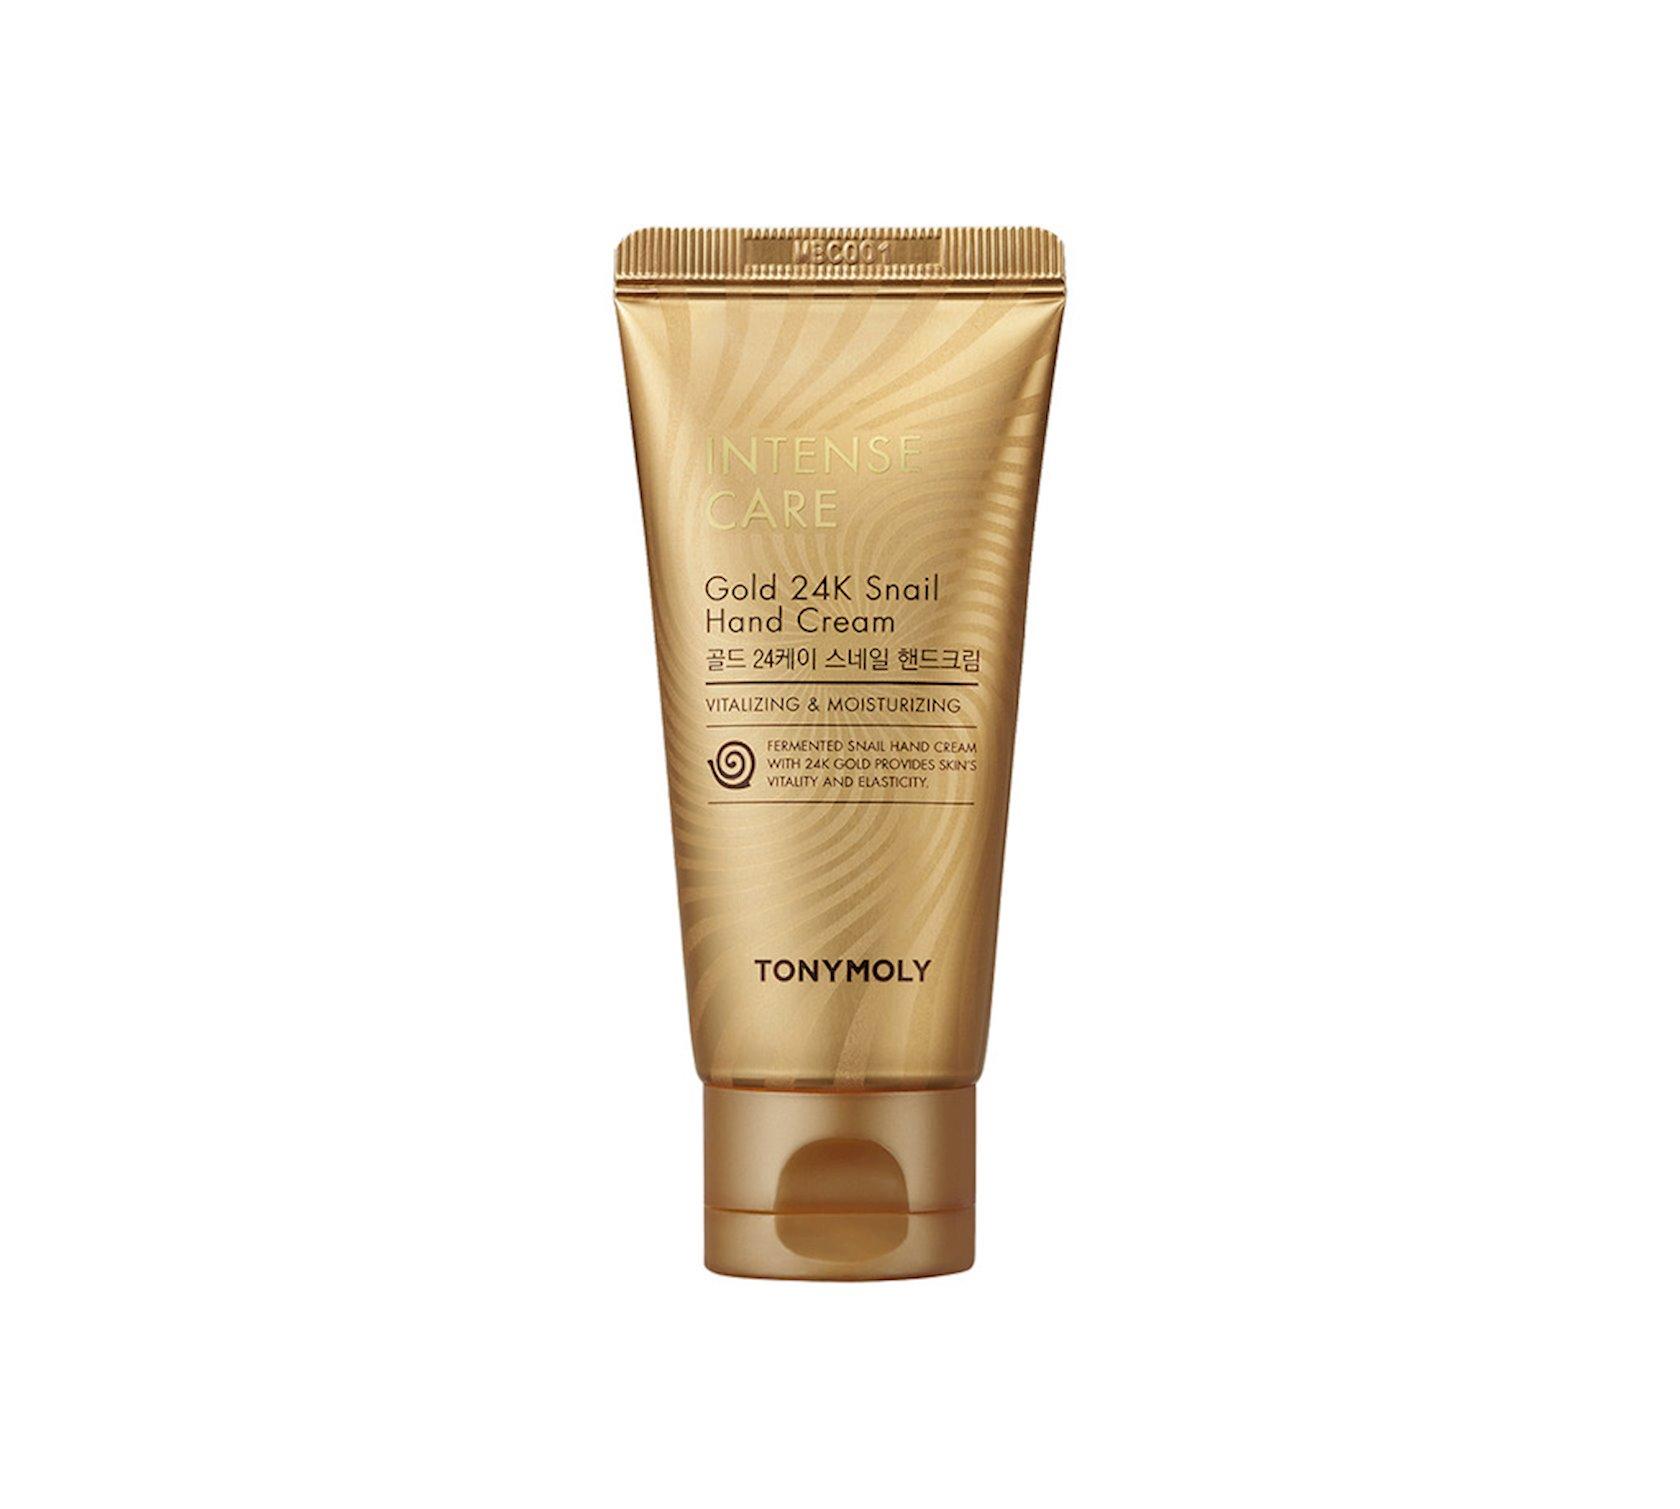 Əl kremi Tony Moly Intense Care Gold 24K Snail Hand Cream 60 ml